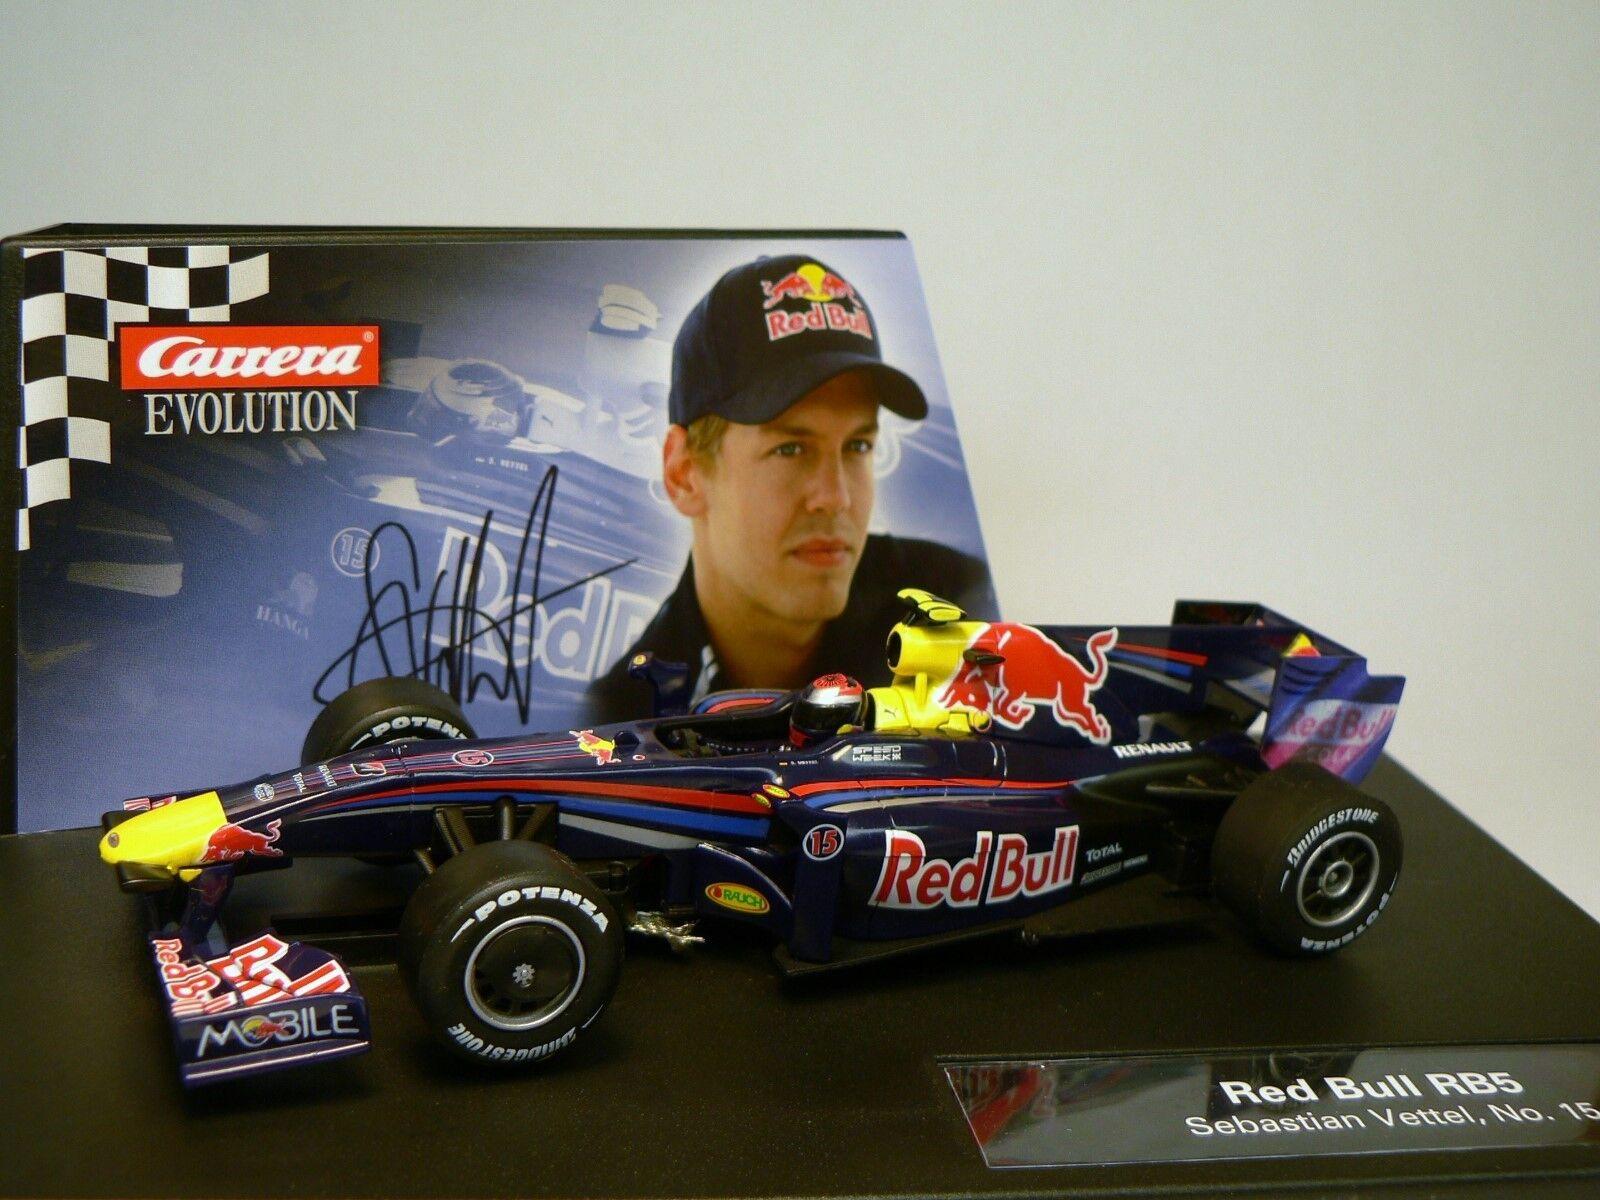 Carrera Evolution 27324 Red Bull RB5 Sebastian Vettel, No. 15 Neu